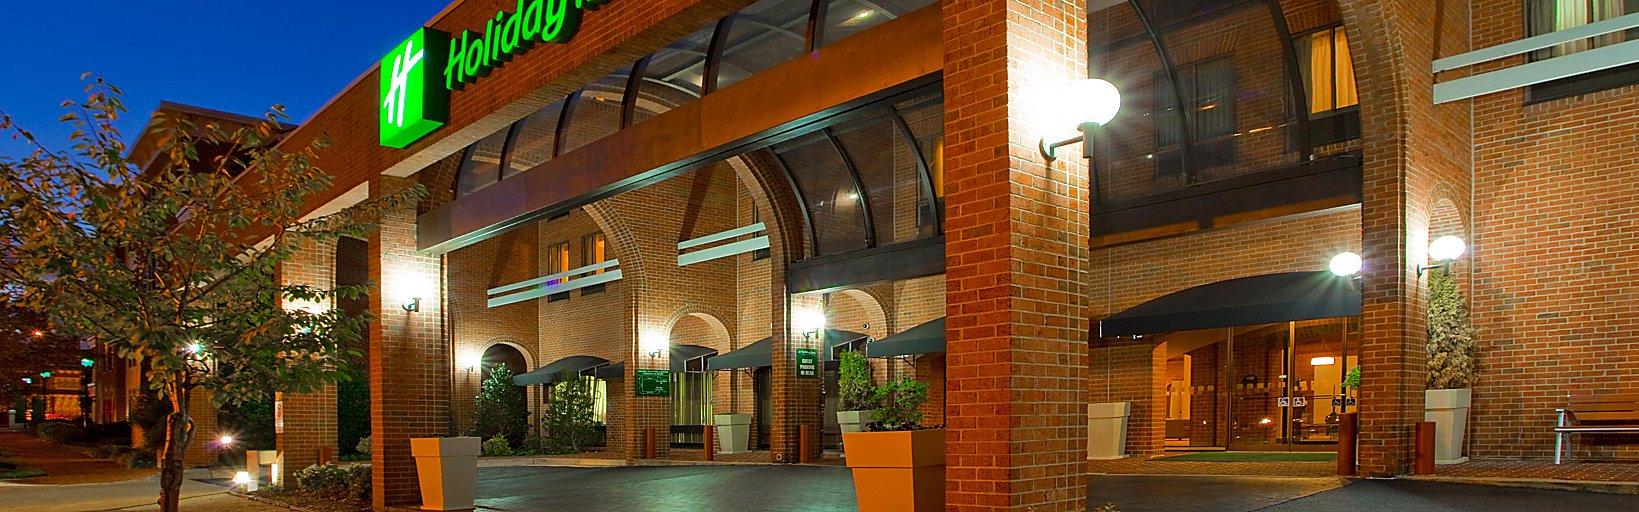 Holiday Inn Exterior Walk To Ping